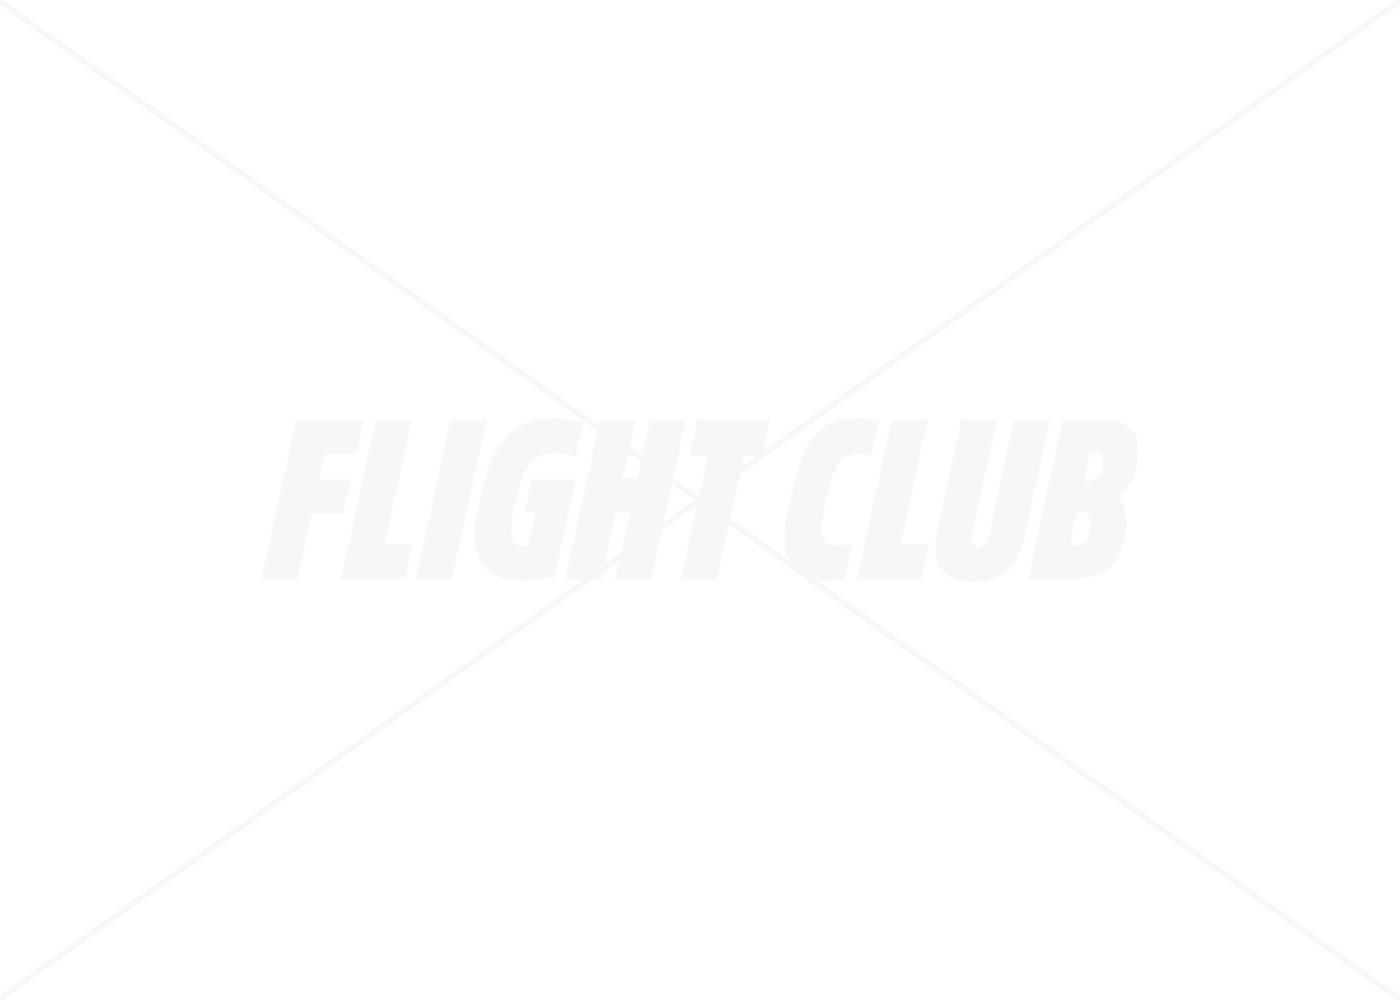 Nike Air Force 1 Faible Qs 1950 Nai Ke De Nianhua boutique pas cher kUQ6i4gQ